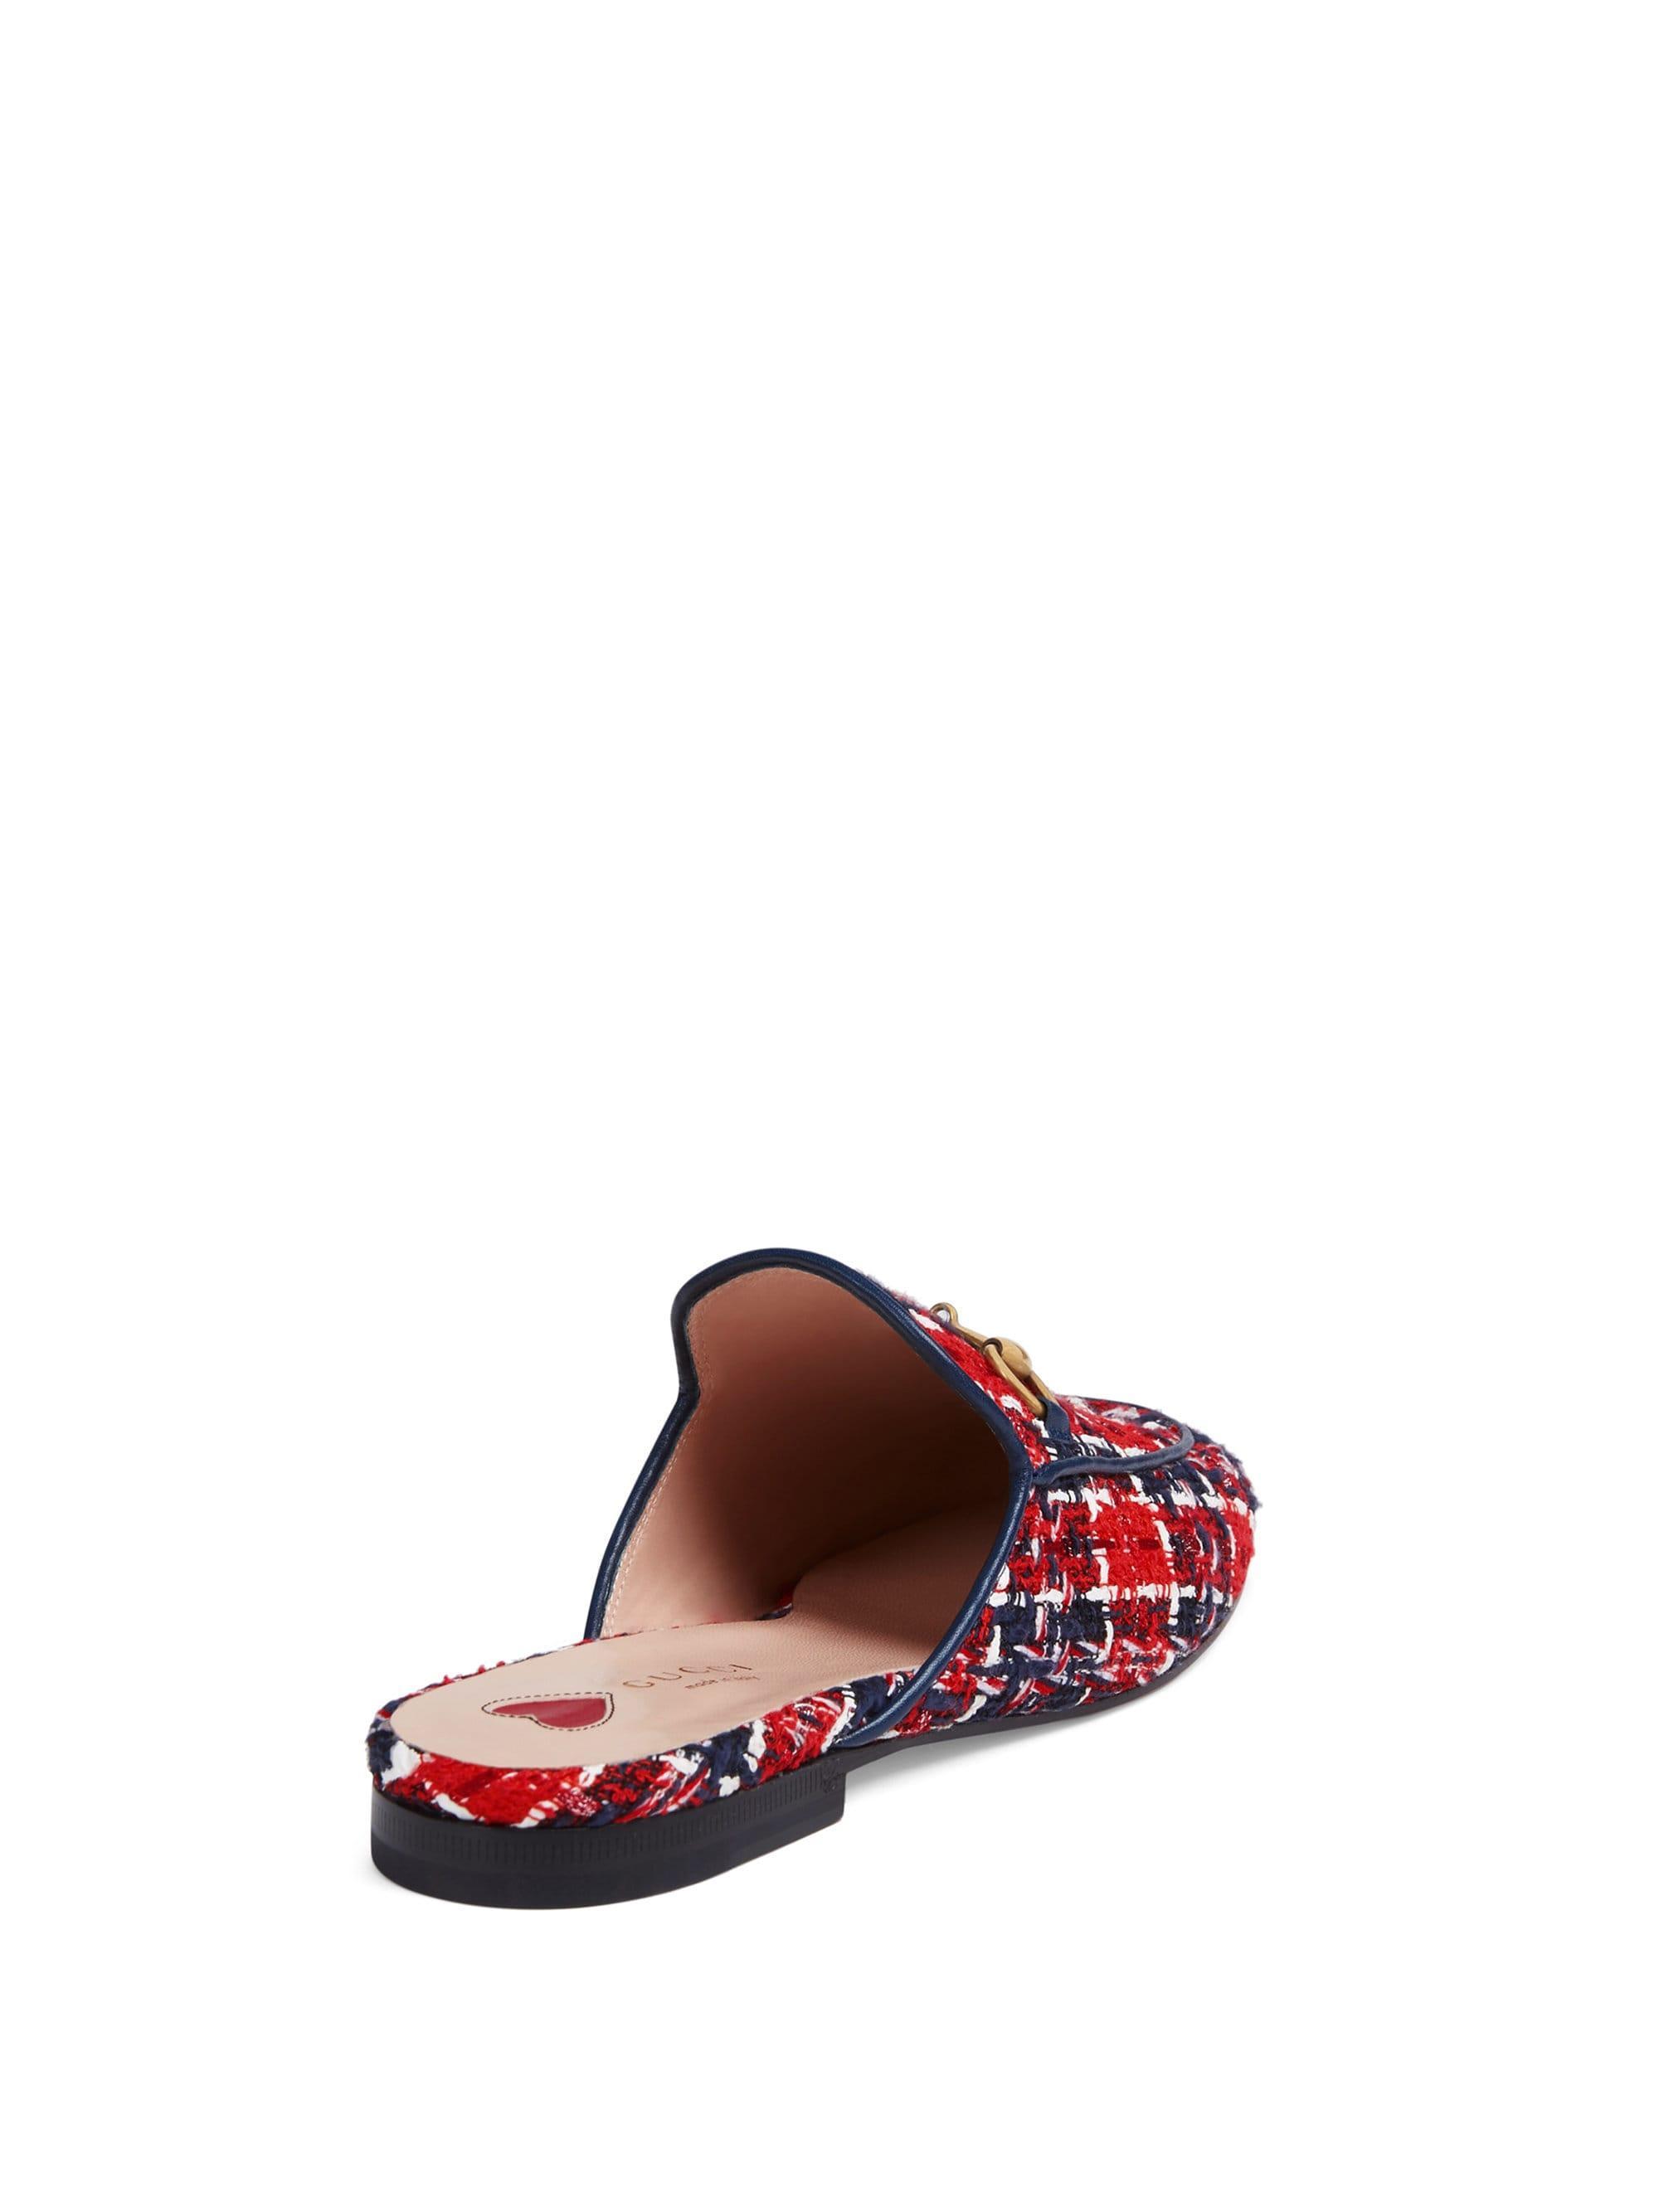 bc8c58e60e1 Gucci Princetown Tweed Check Slipper in Red - Lyst